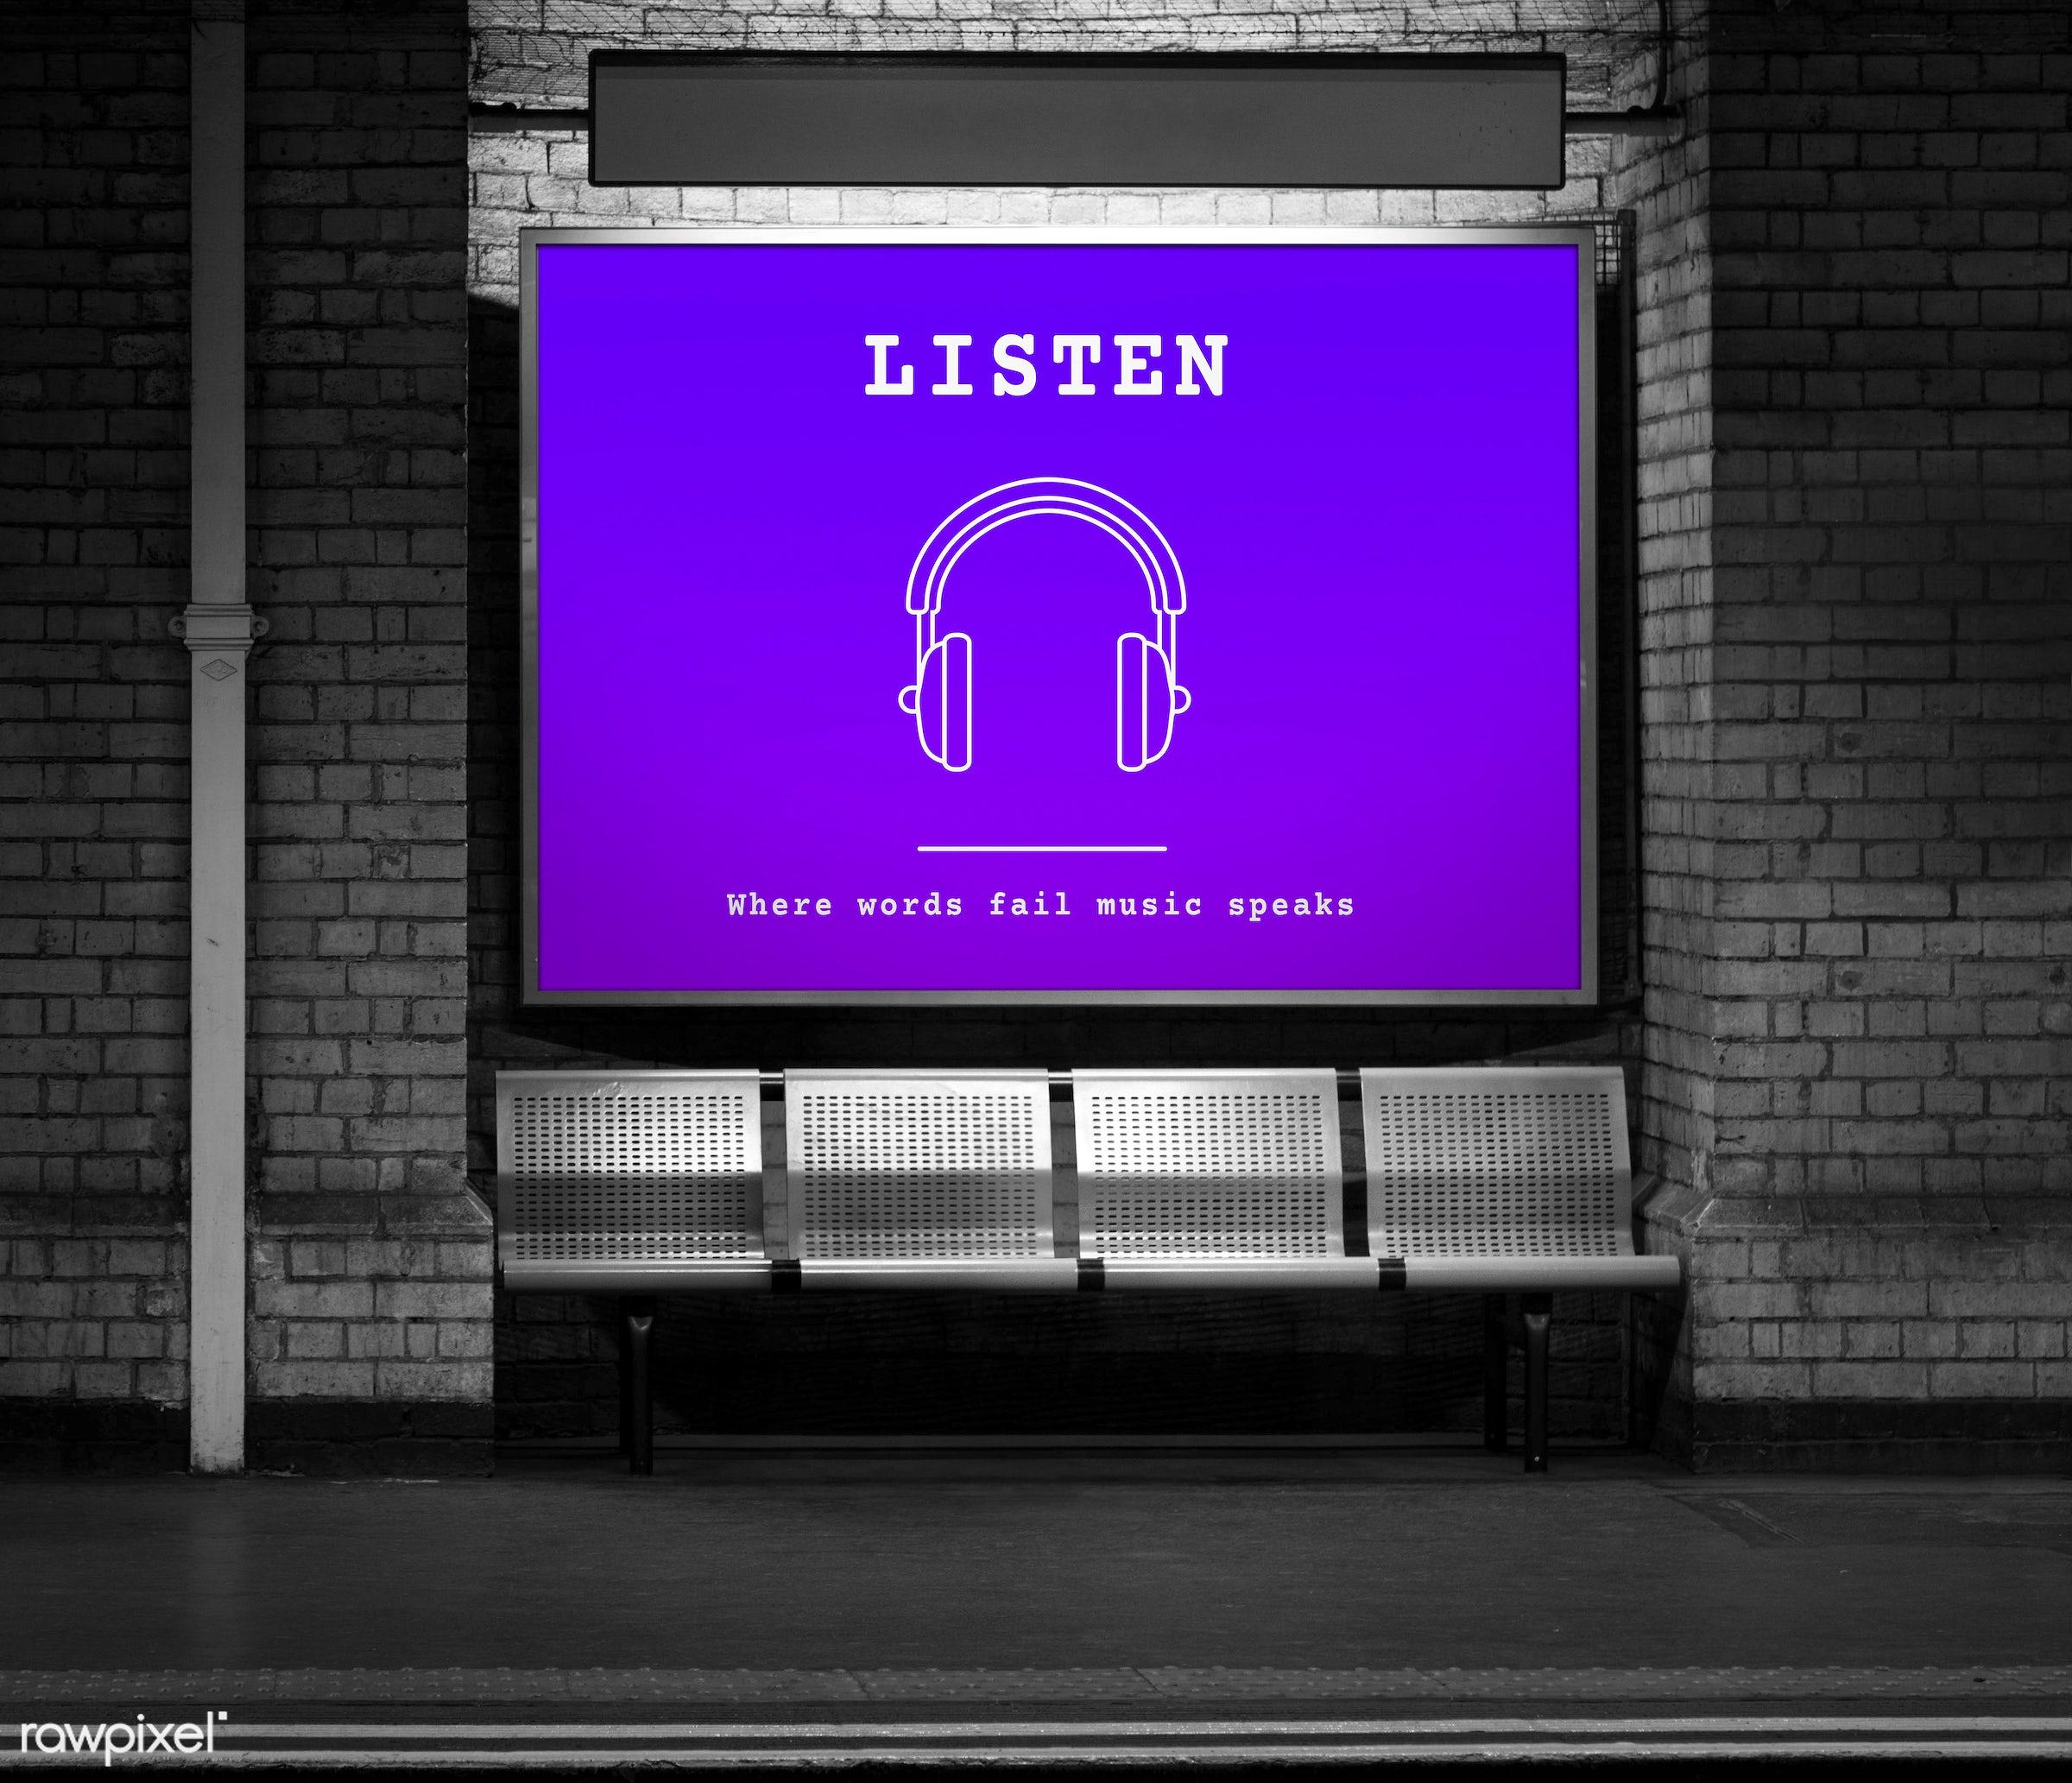 apps, audio, bricks, brickswall, broadcast, devices, entertainment, graphic, harmony, headphones, icon, listen, media, music...